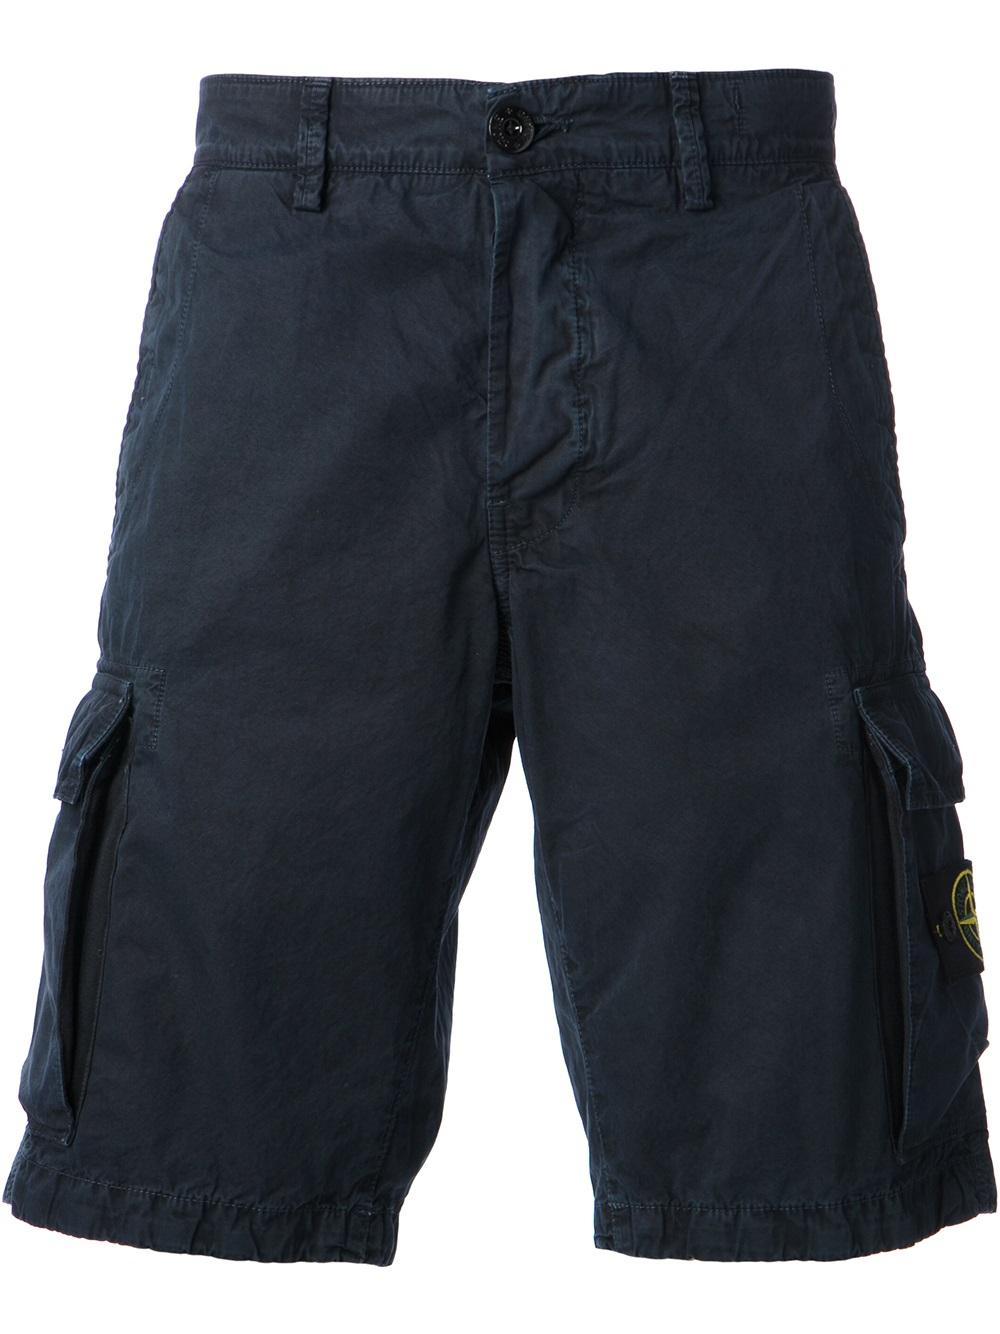 lyst stone island washed cargo shorts in blue for men. Black Bedroom Furniture Sets. Home Design Ideas